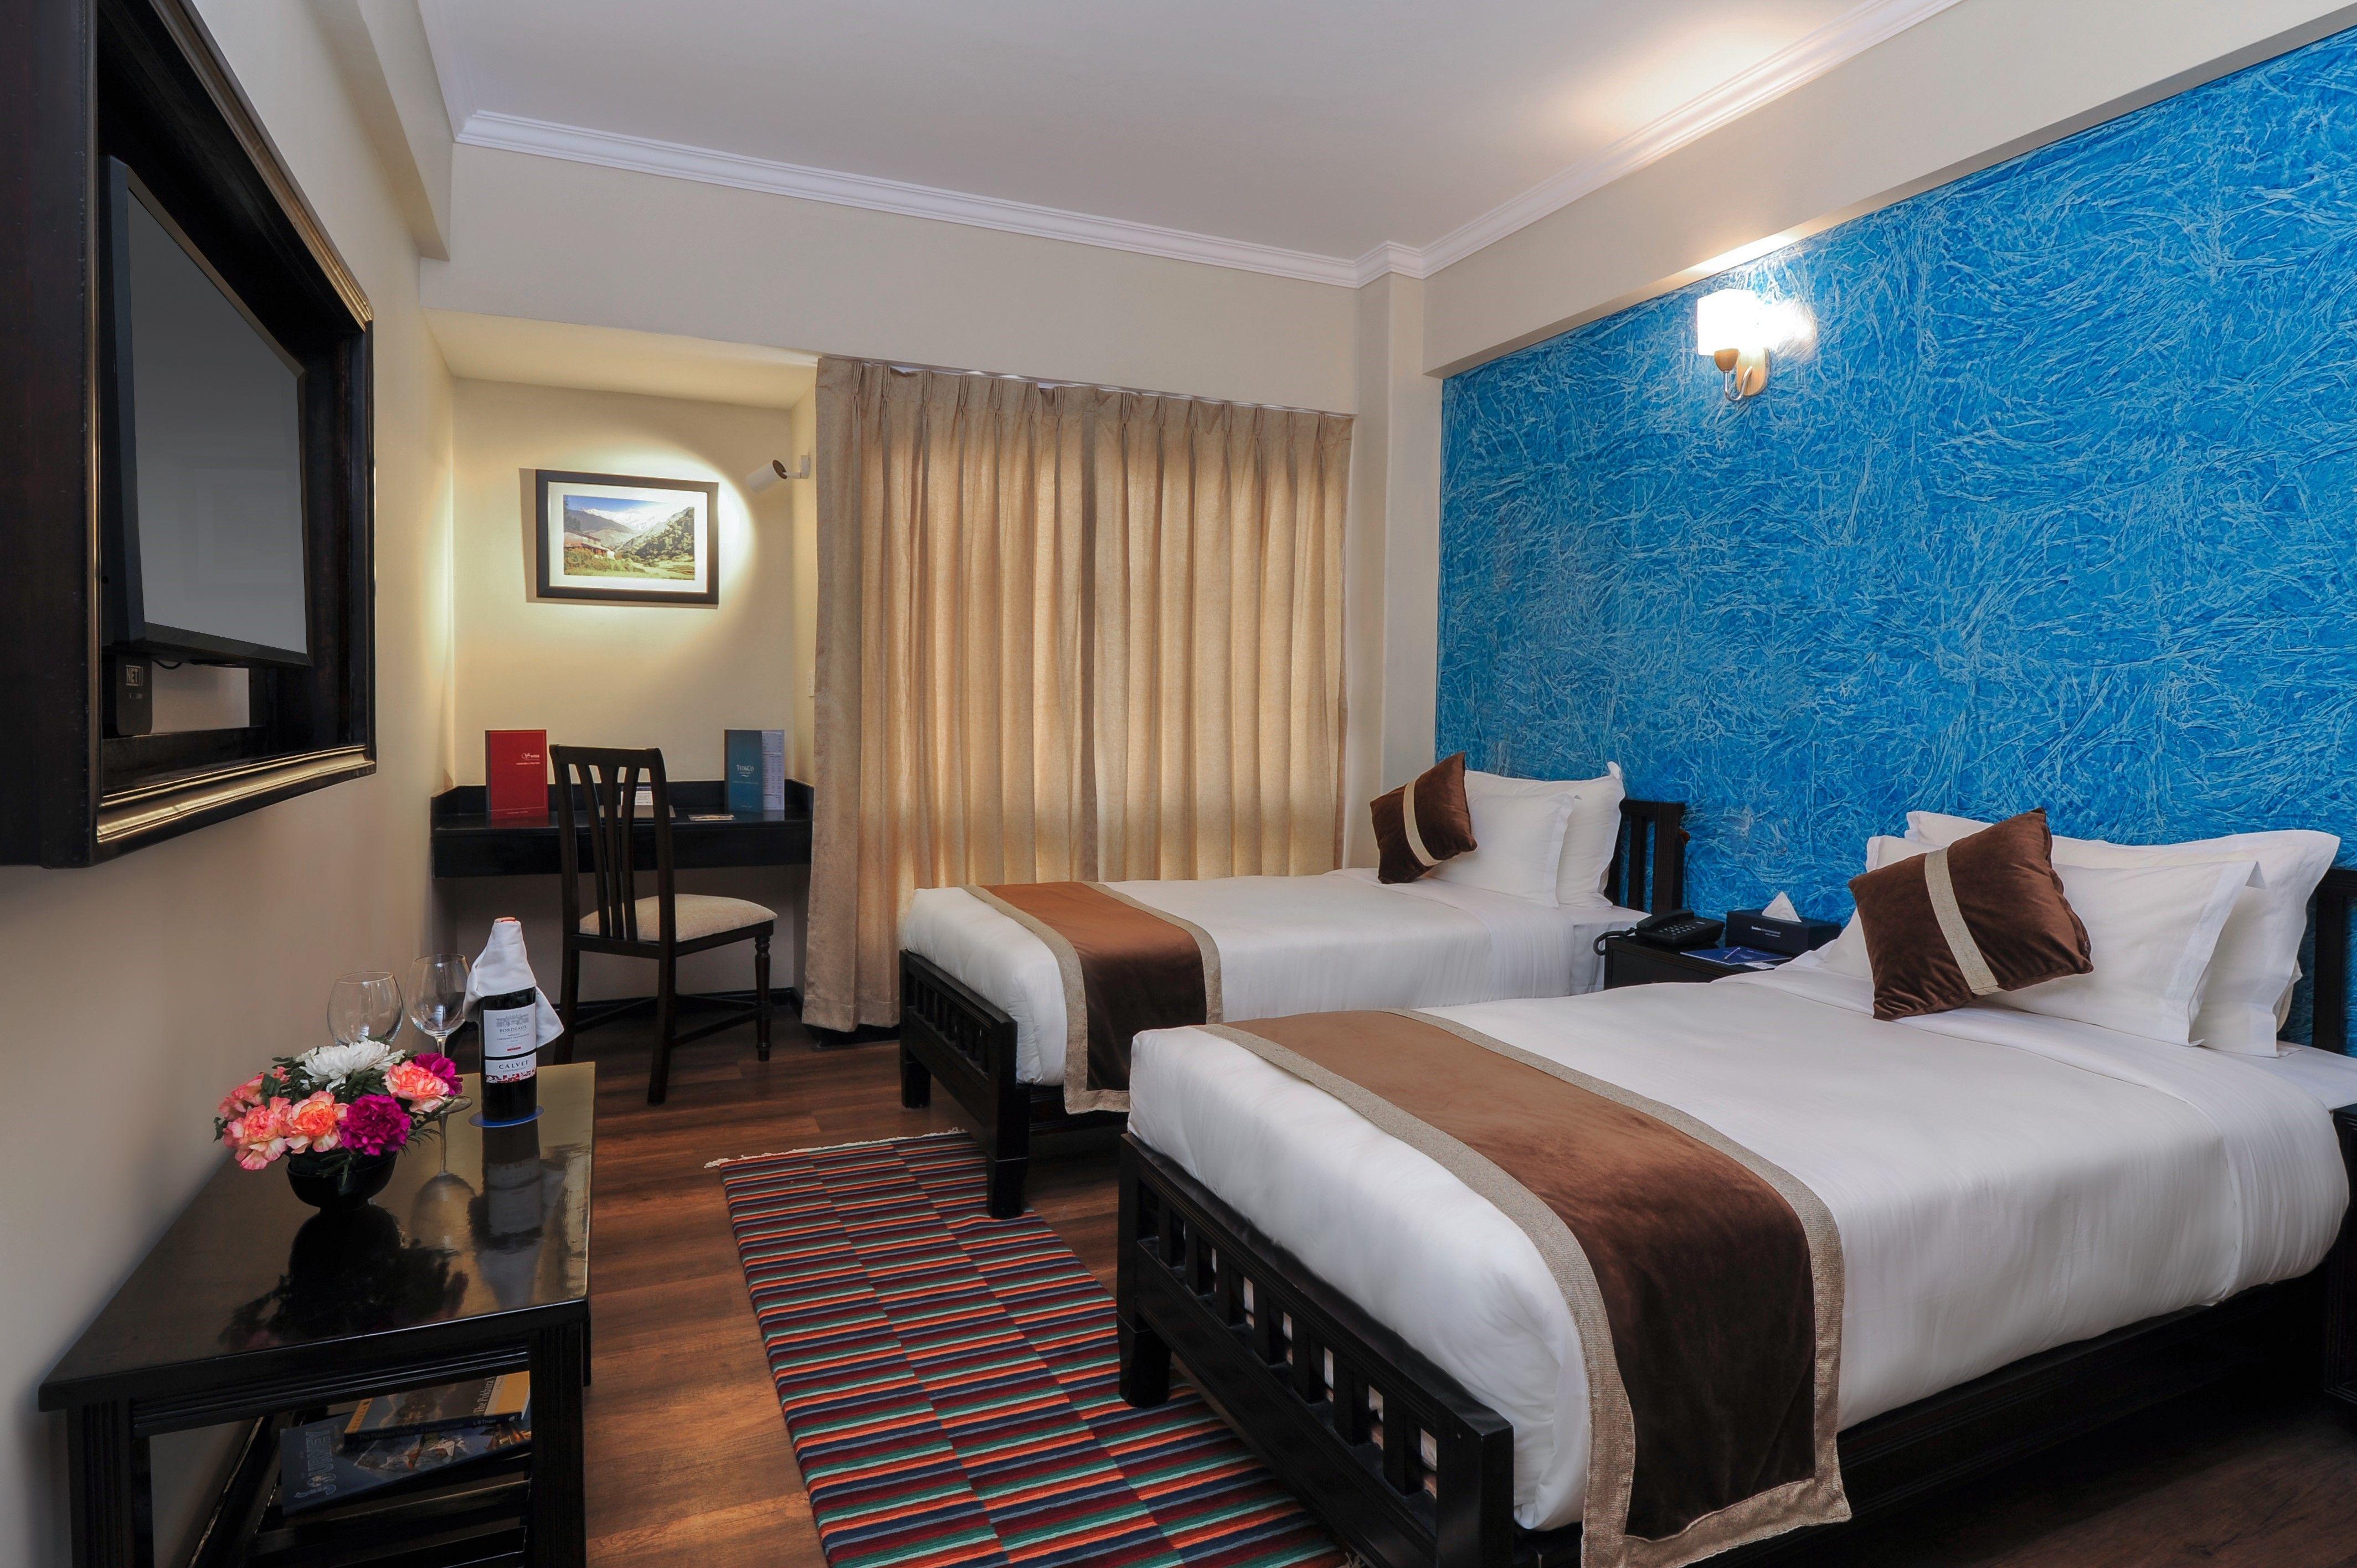 Twinroom Suite Suitedreams Hotelsinnepal Explorenepal